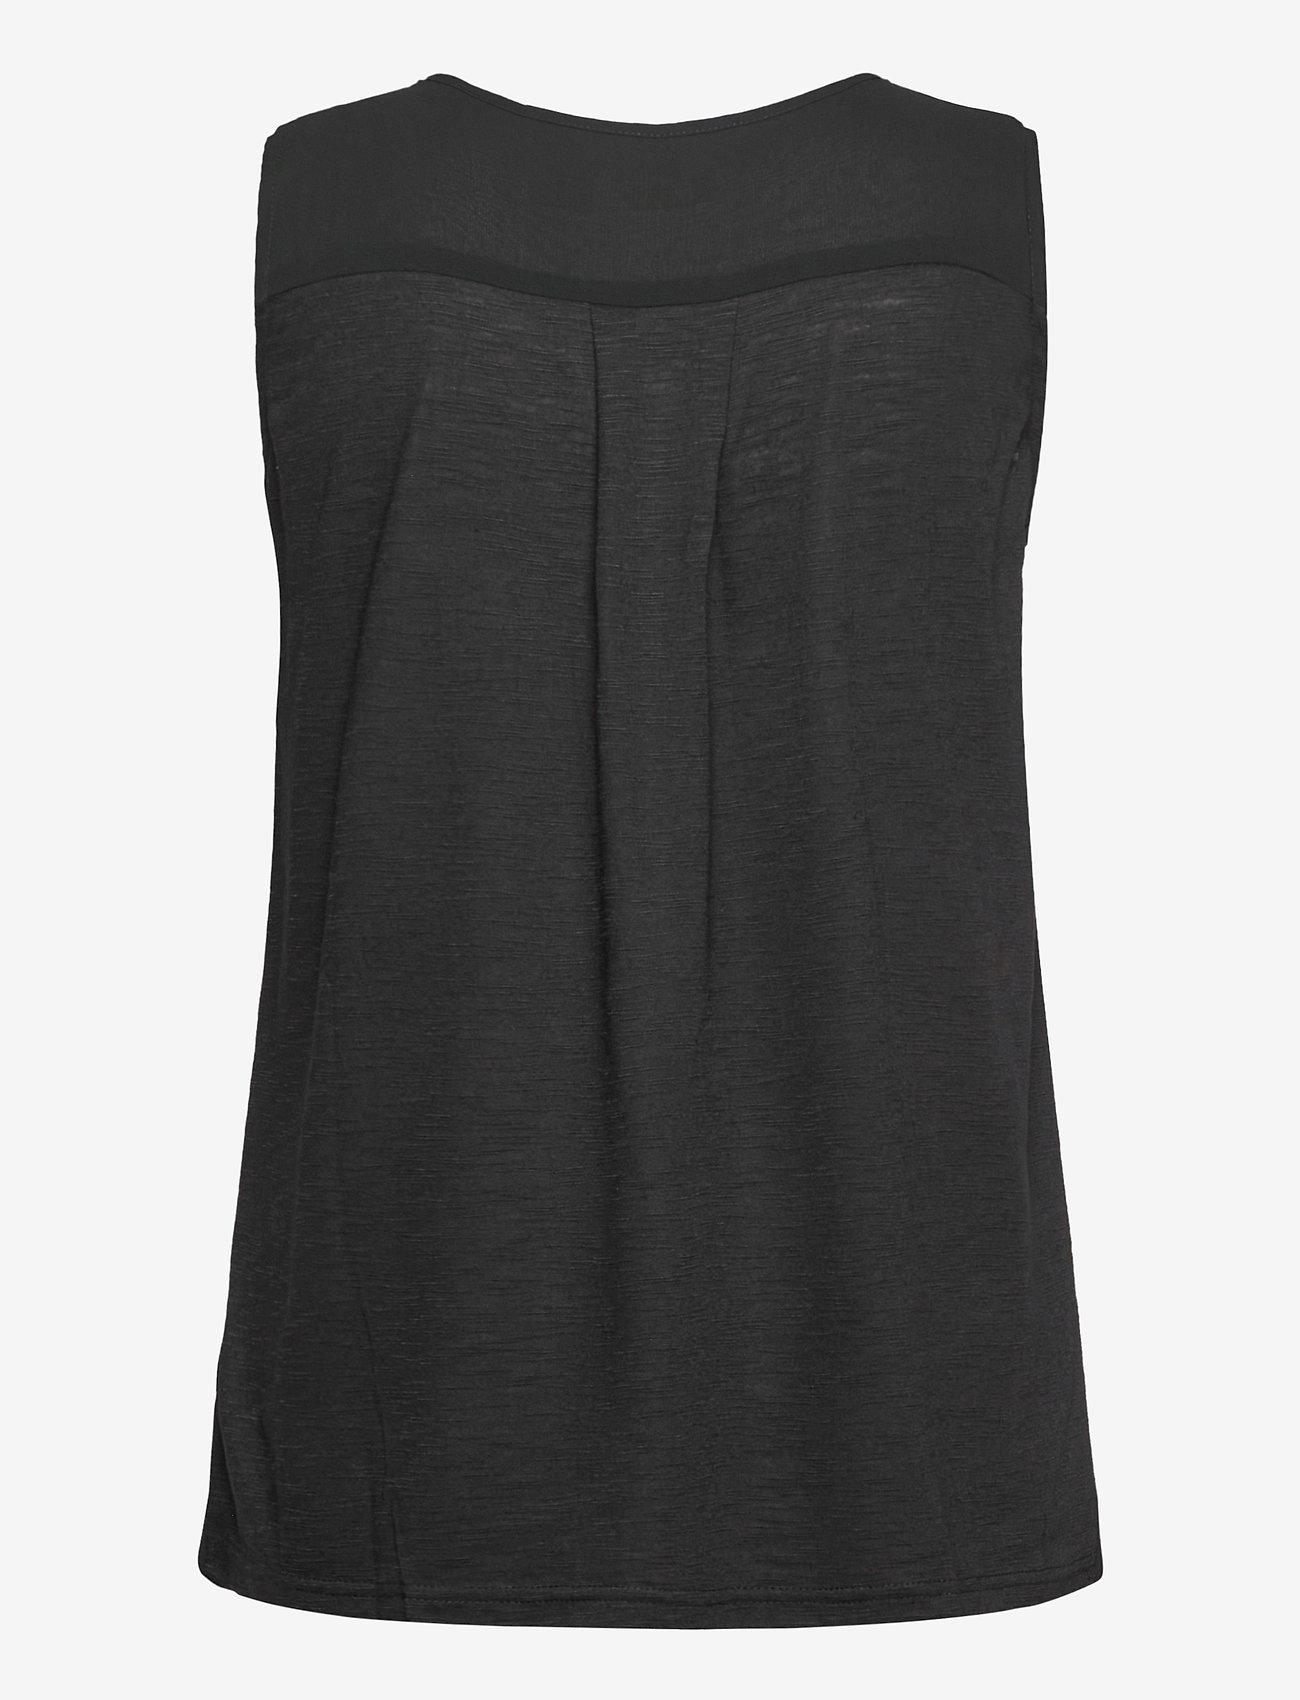 Fransa - Zawov 3 Top - sleeveless tops - black - 1